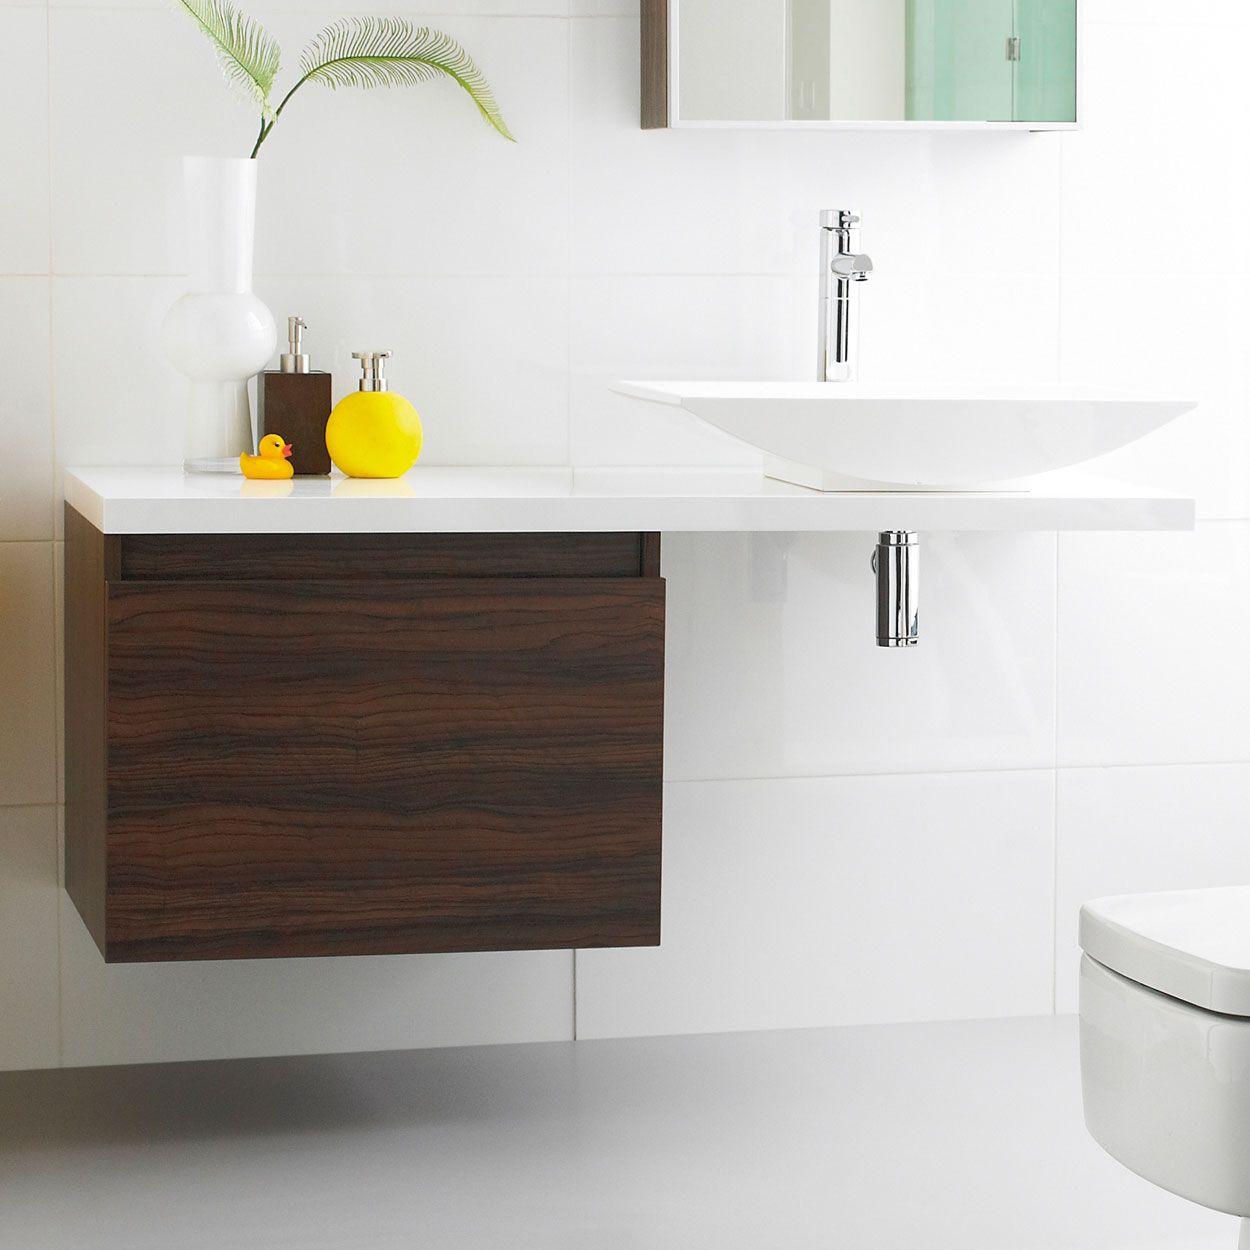 Vanity bathroom sink units - Prague Wall Mounted Bathroom Vanity Unit And Basin 1200mm Wide Walnut